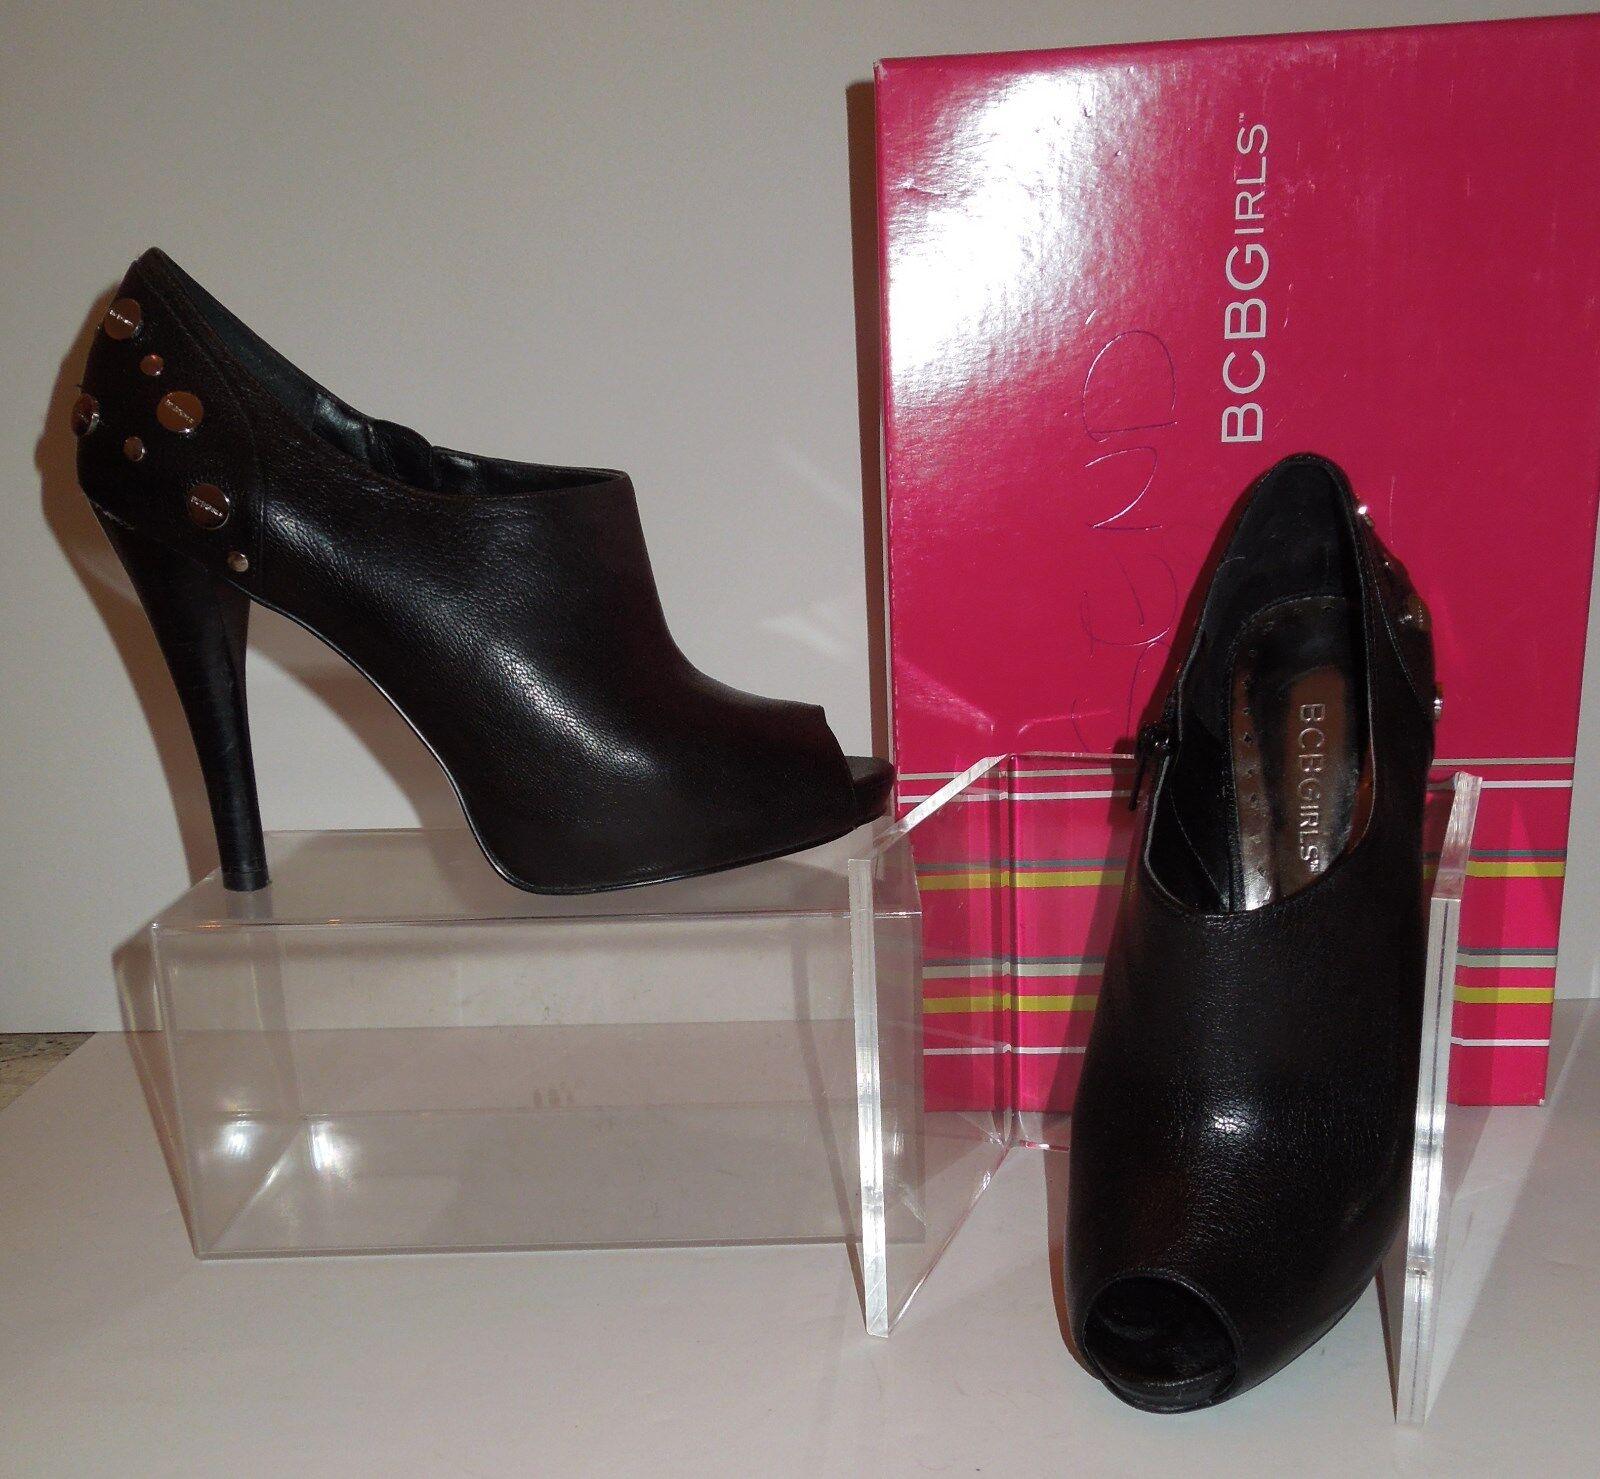 ultimi stili BCBGirls  DANA2  Pebbled Pebbled Pebbled Leather Studded Open Toe Platform scarpe avvioie 7.5M  consegna veloce